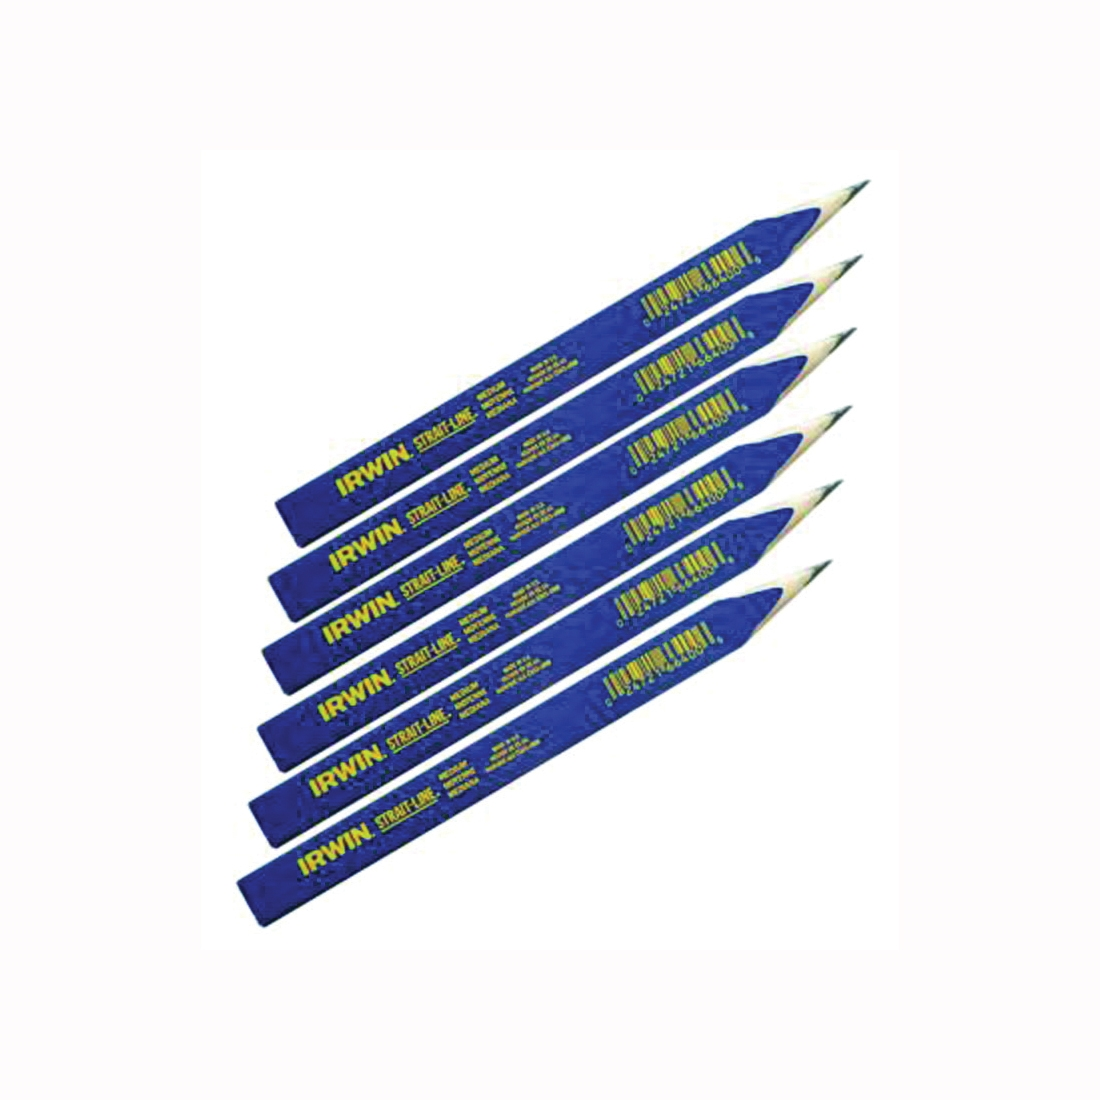 Picture of IRWIN 66301 Carpenter Pencil, Blue, 7 in L, Wood Barrel